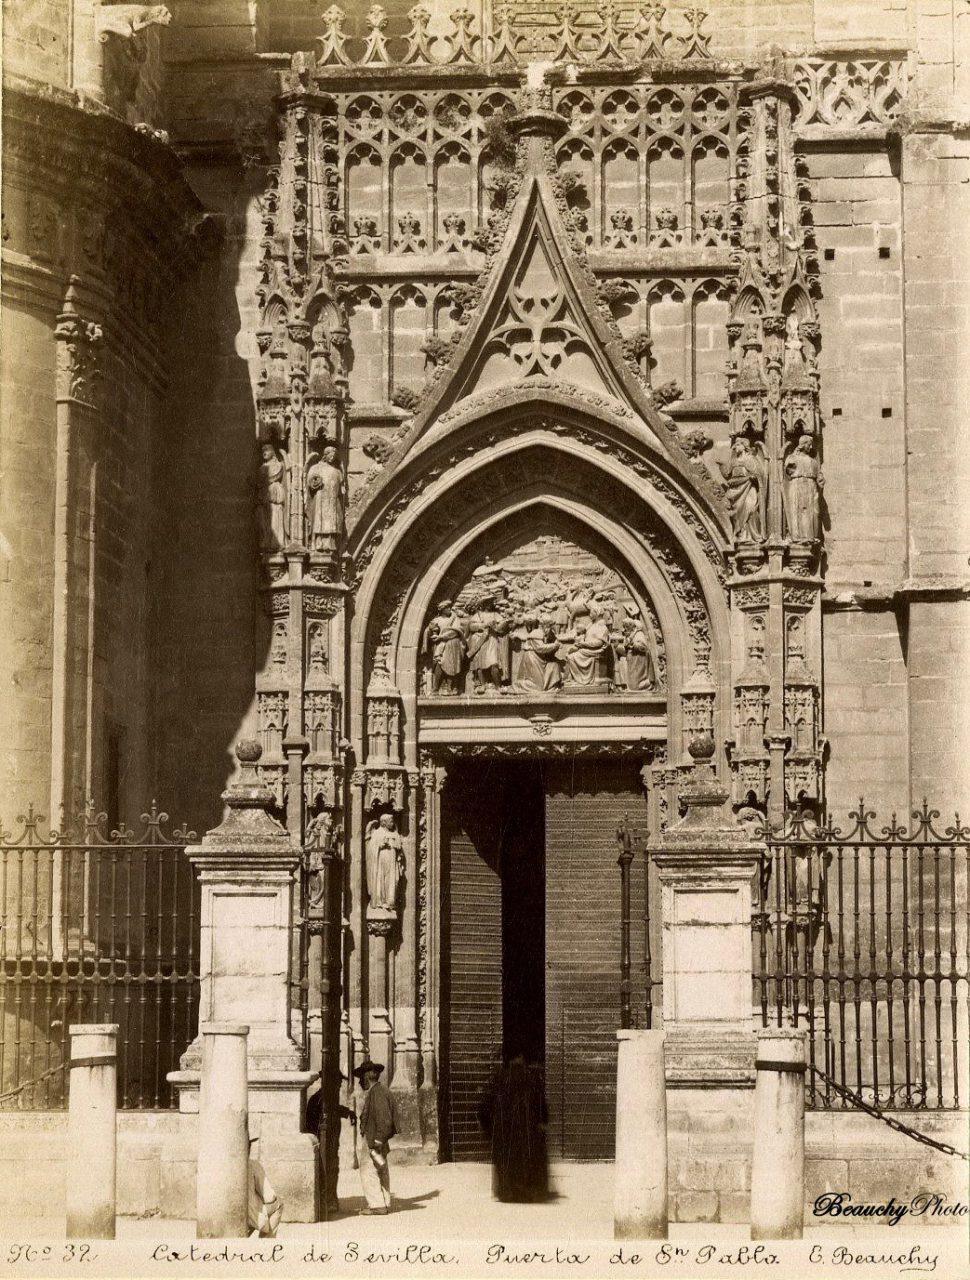 Puerta de San Pablo de la Catedral de Sevilla 1880